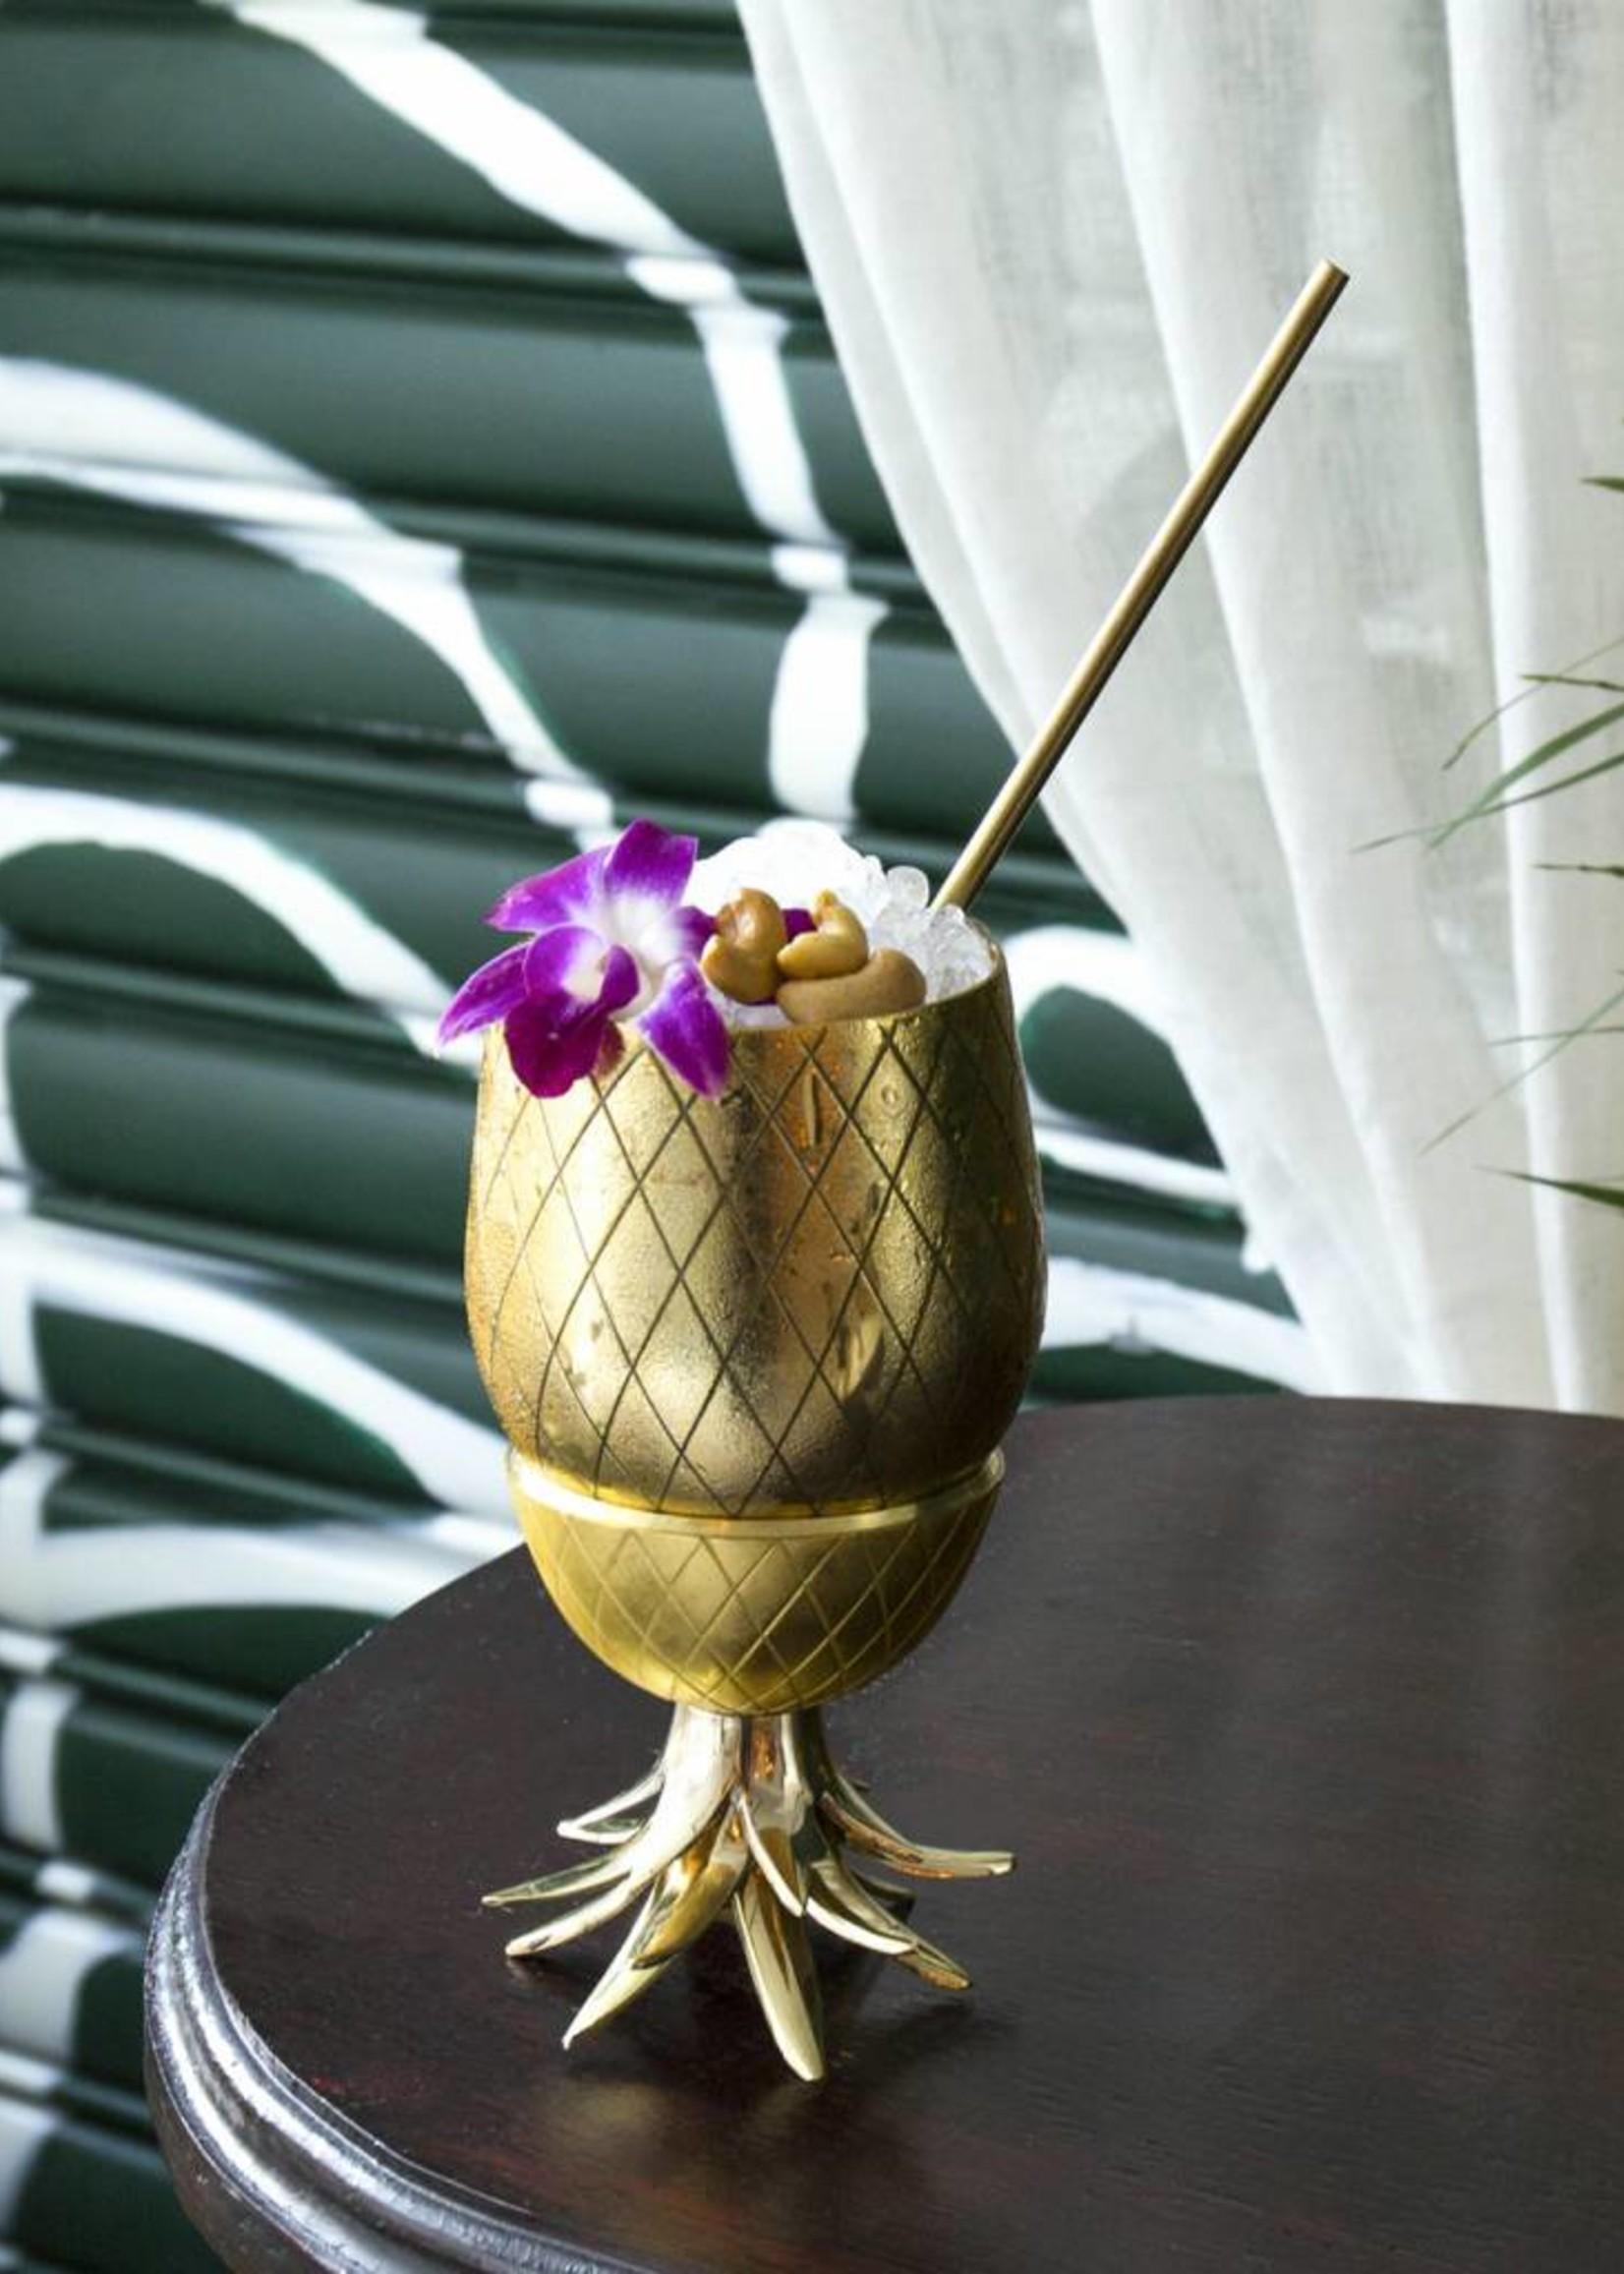 W&P Pineapple Tumbler